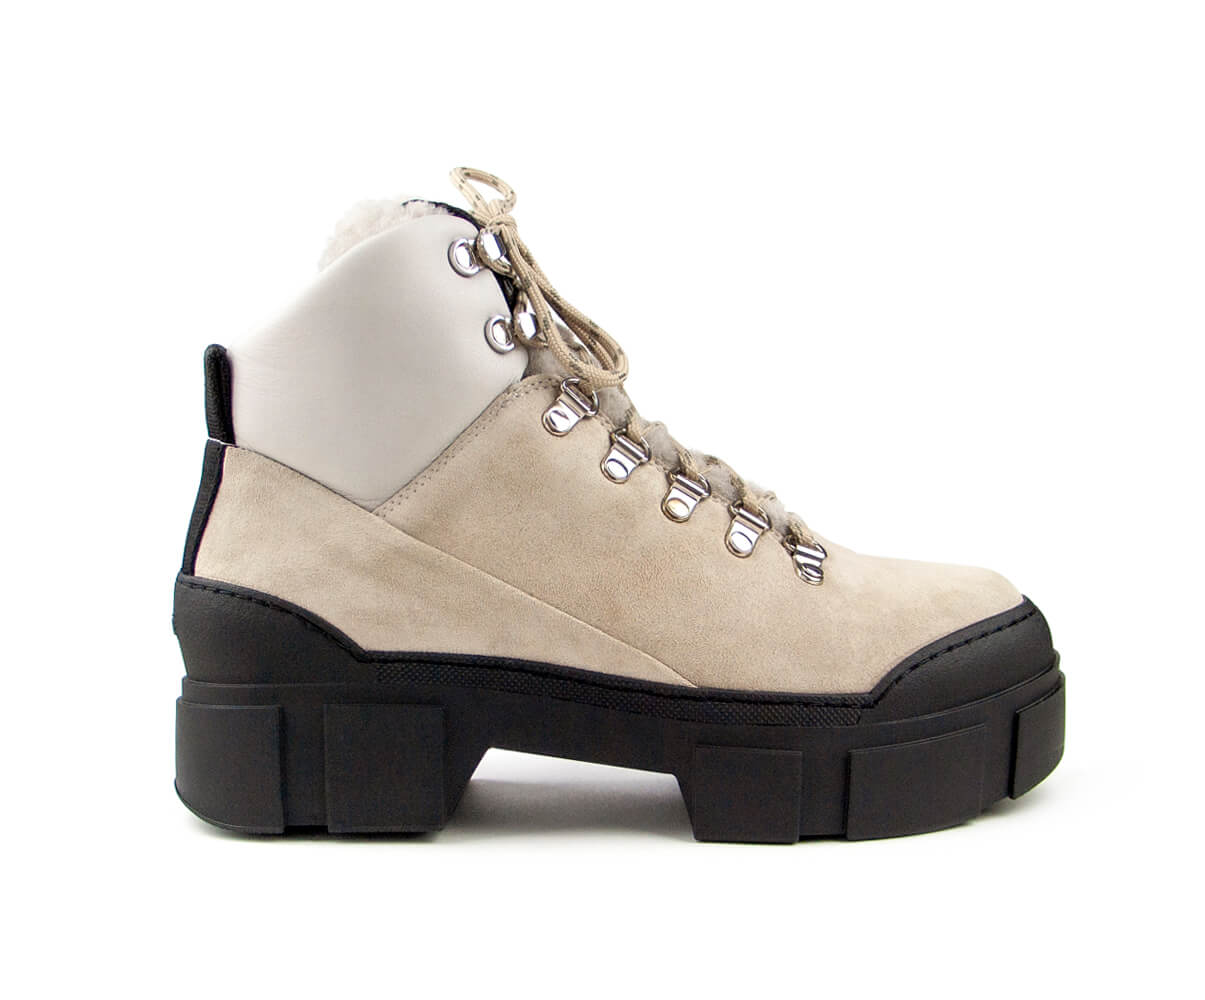 007 ecla scarpe rgb